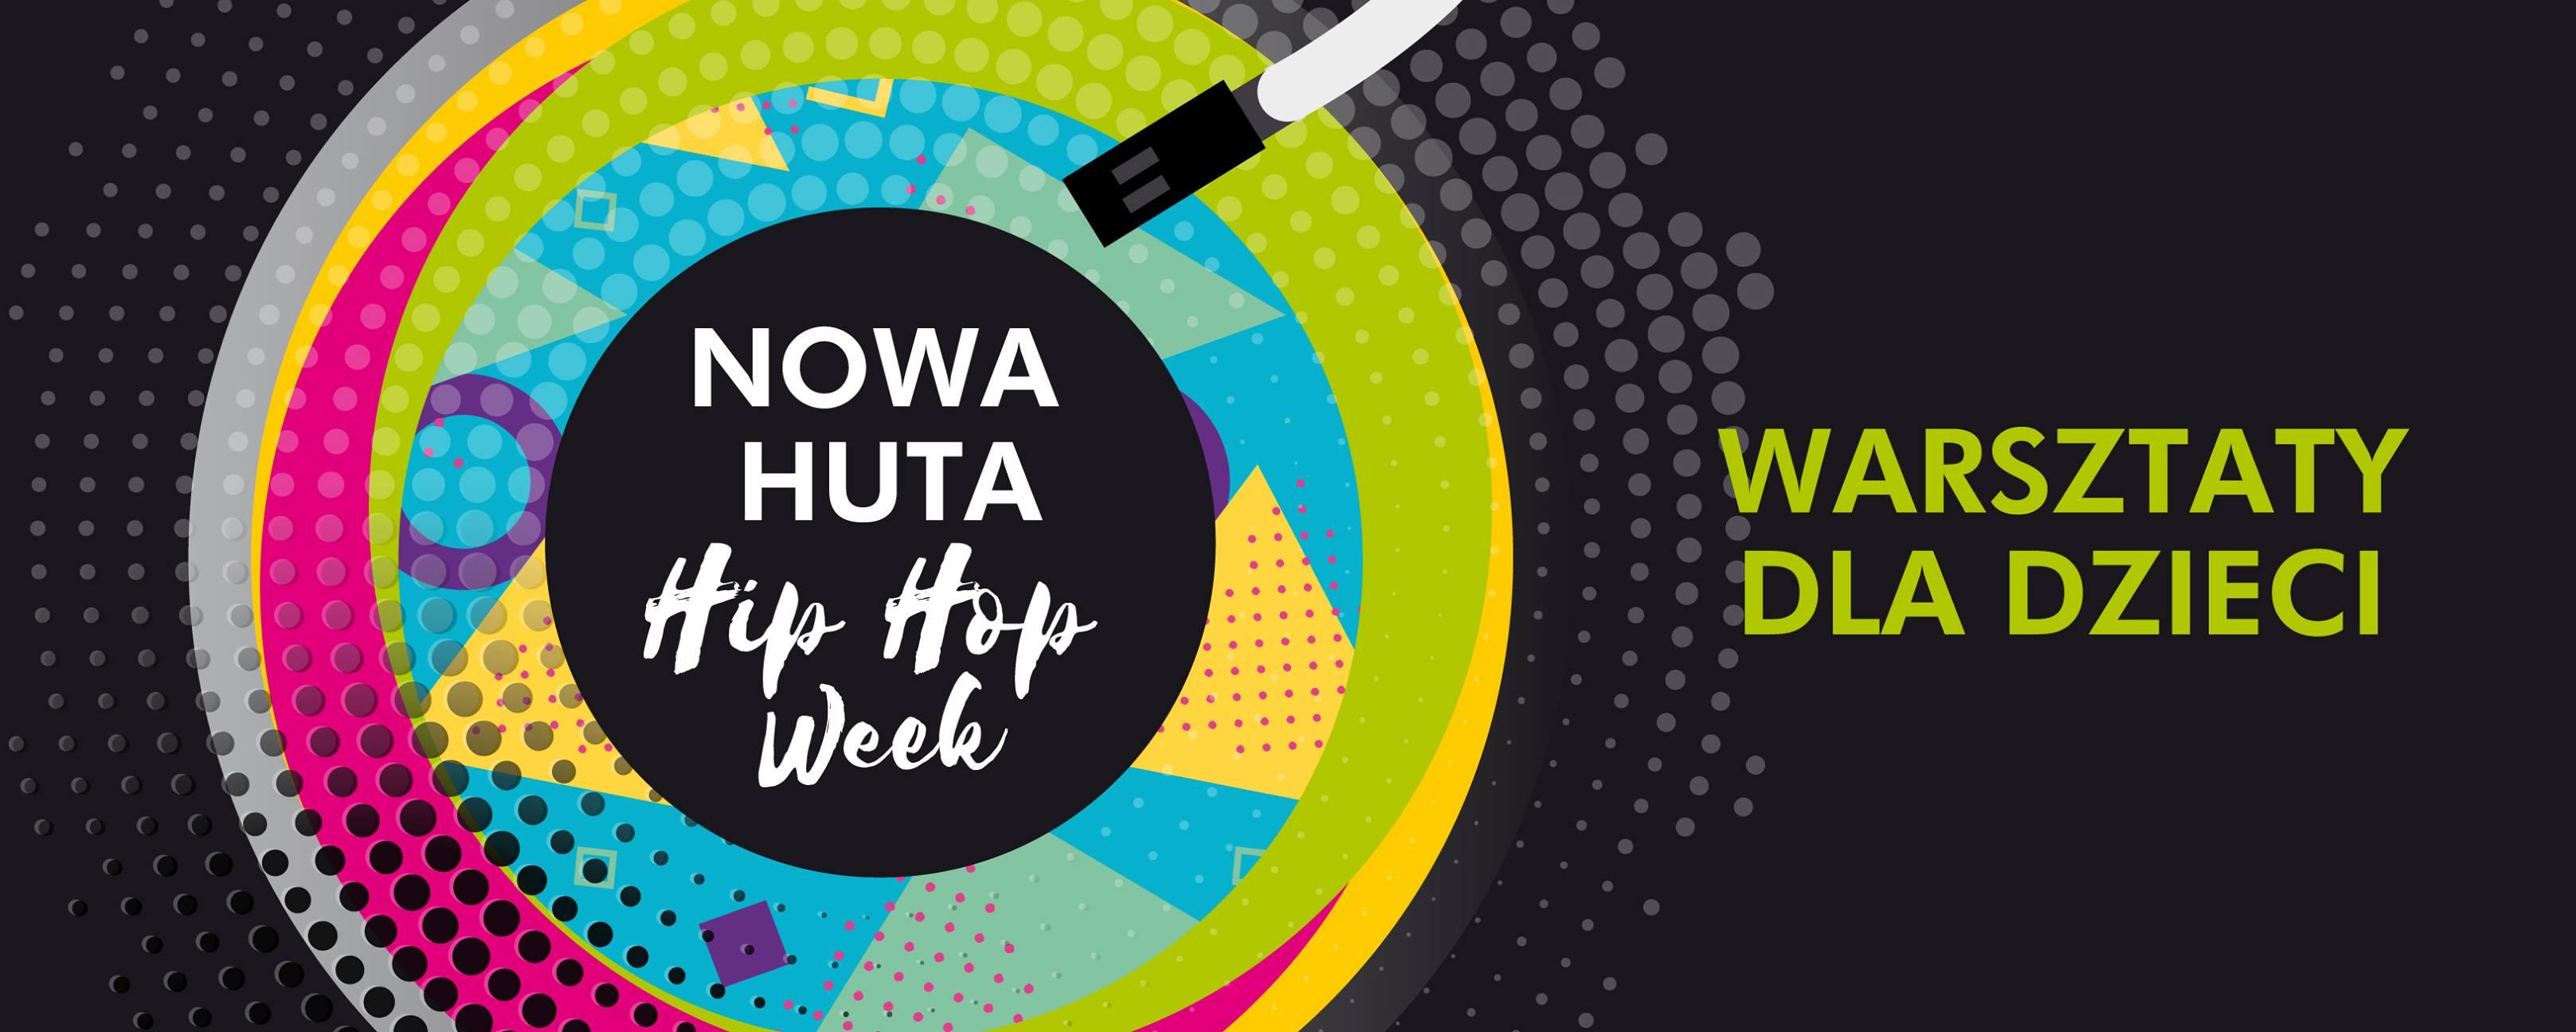 nowa huta hip hop